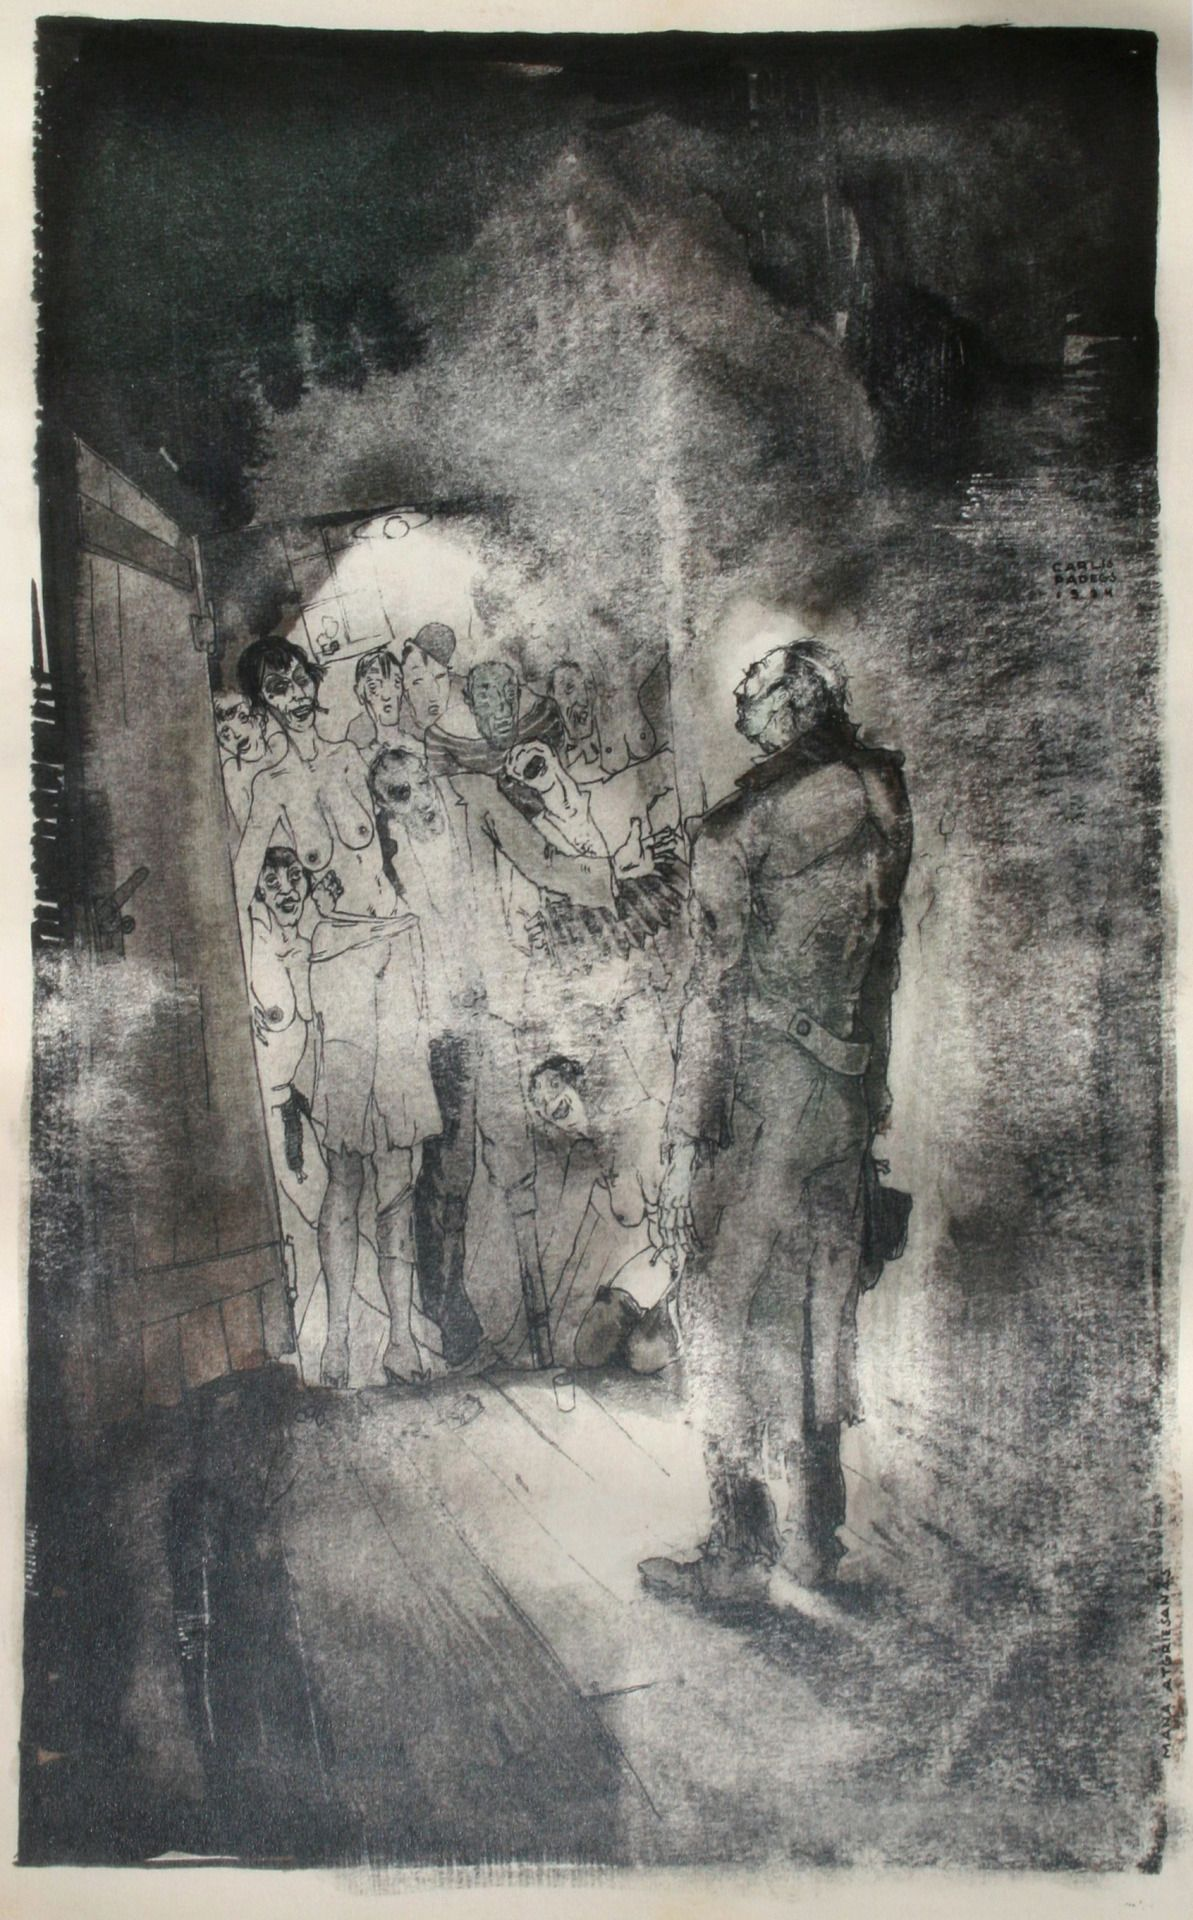 """My Return"" by Karlis Padegs (1934)"